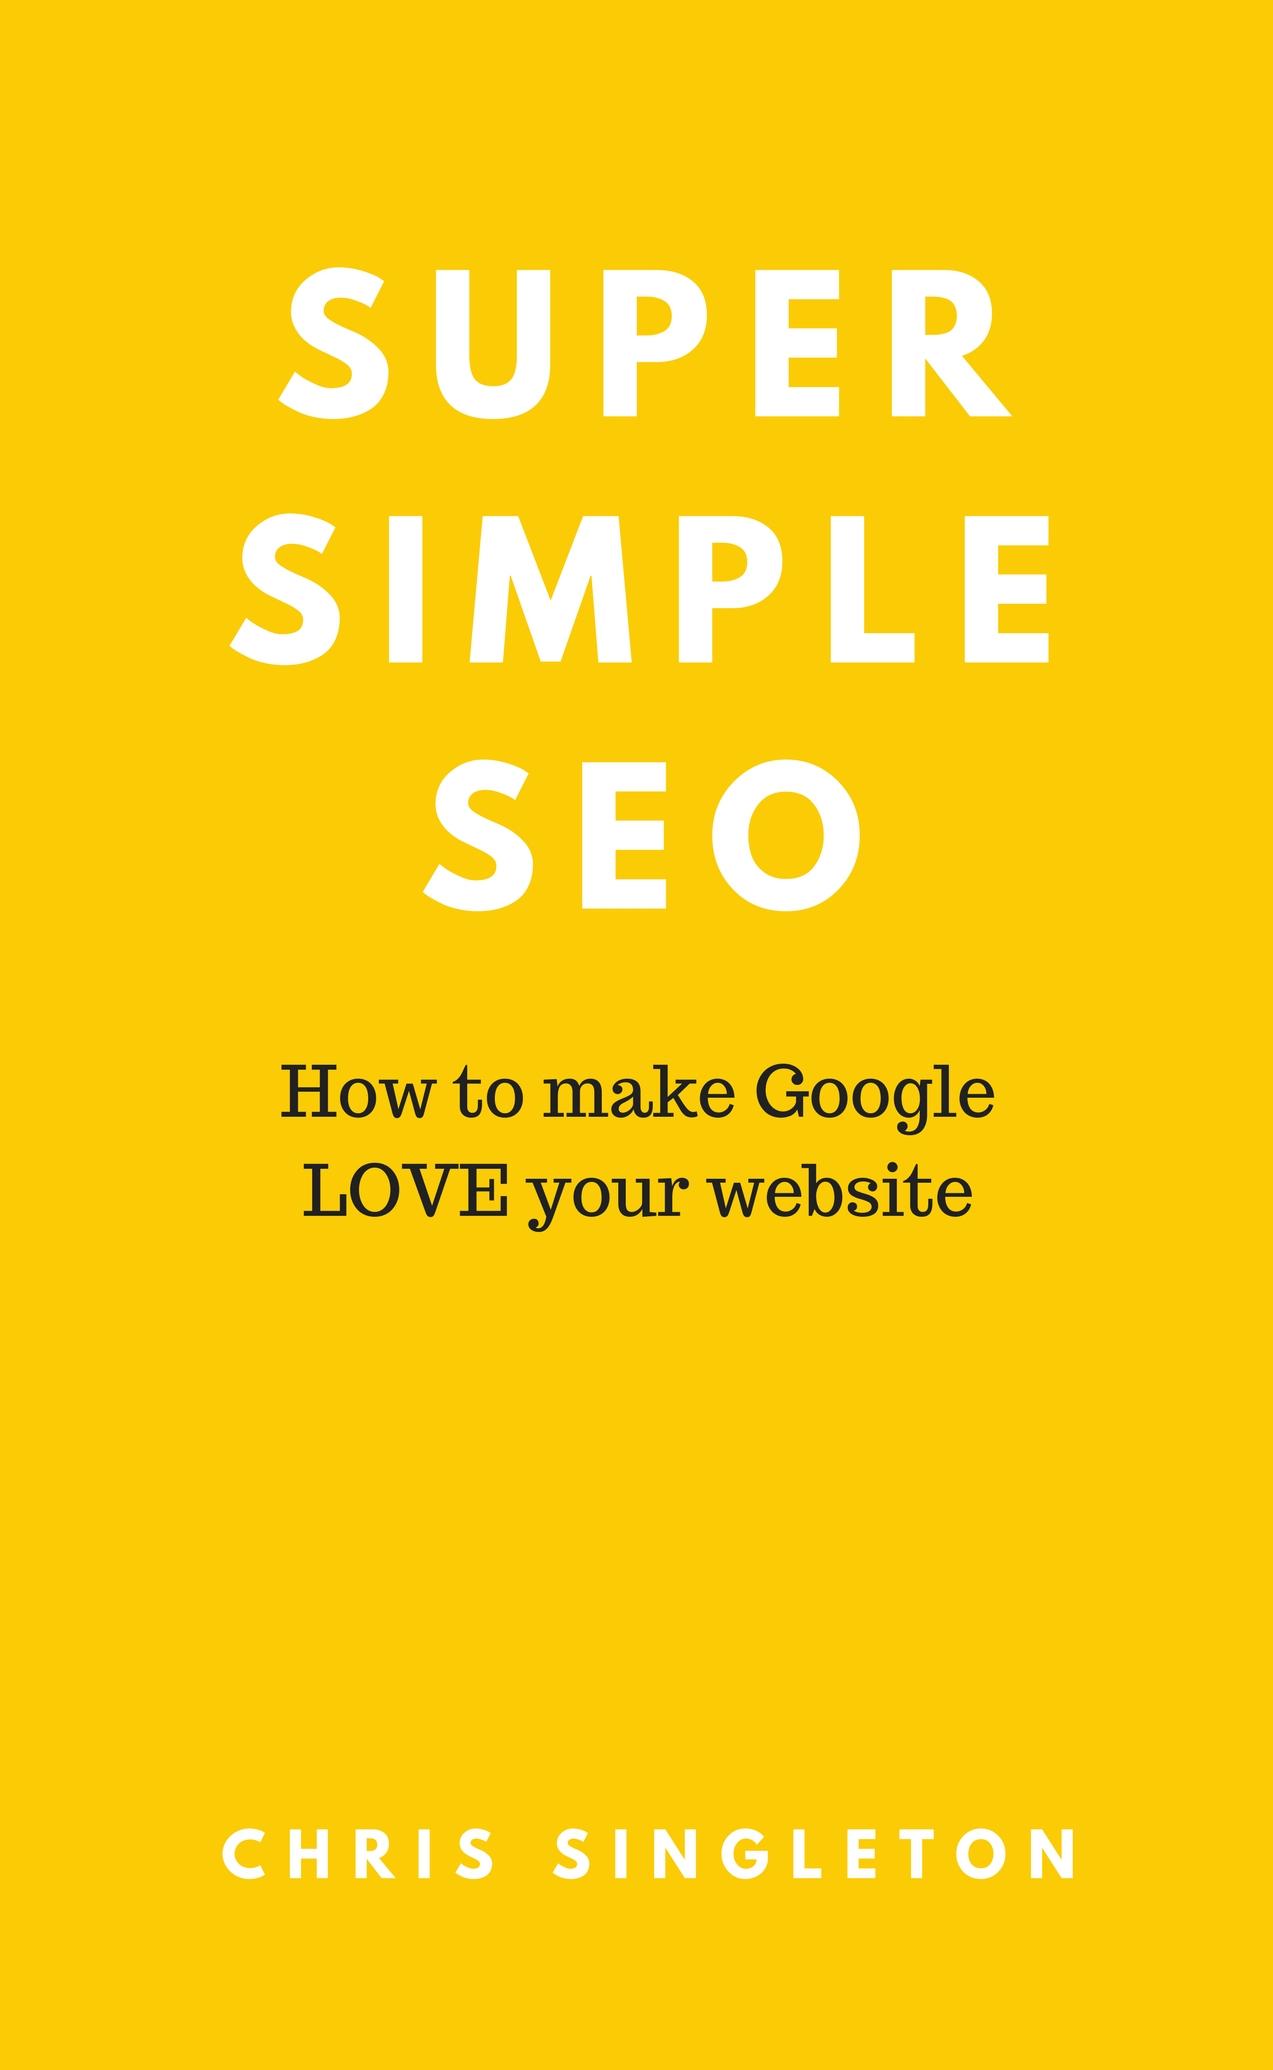 Super Simple SEO Book